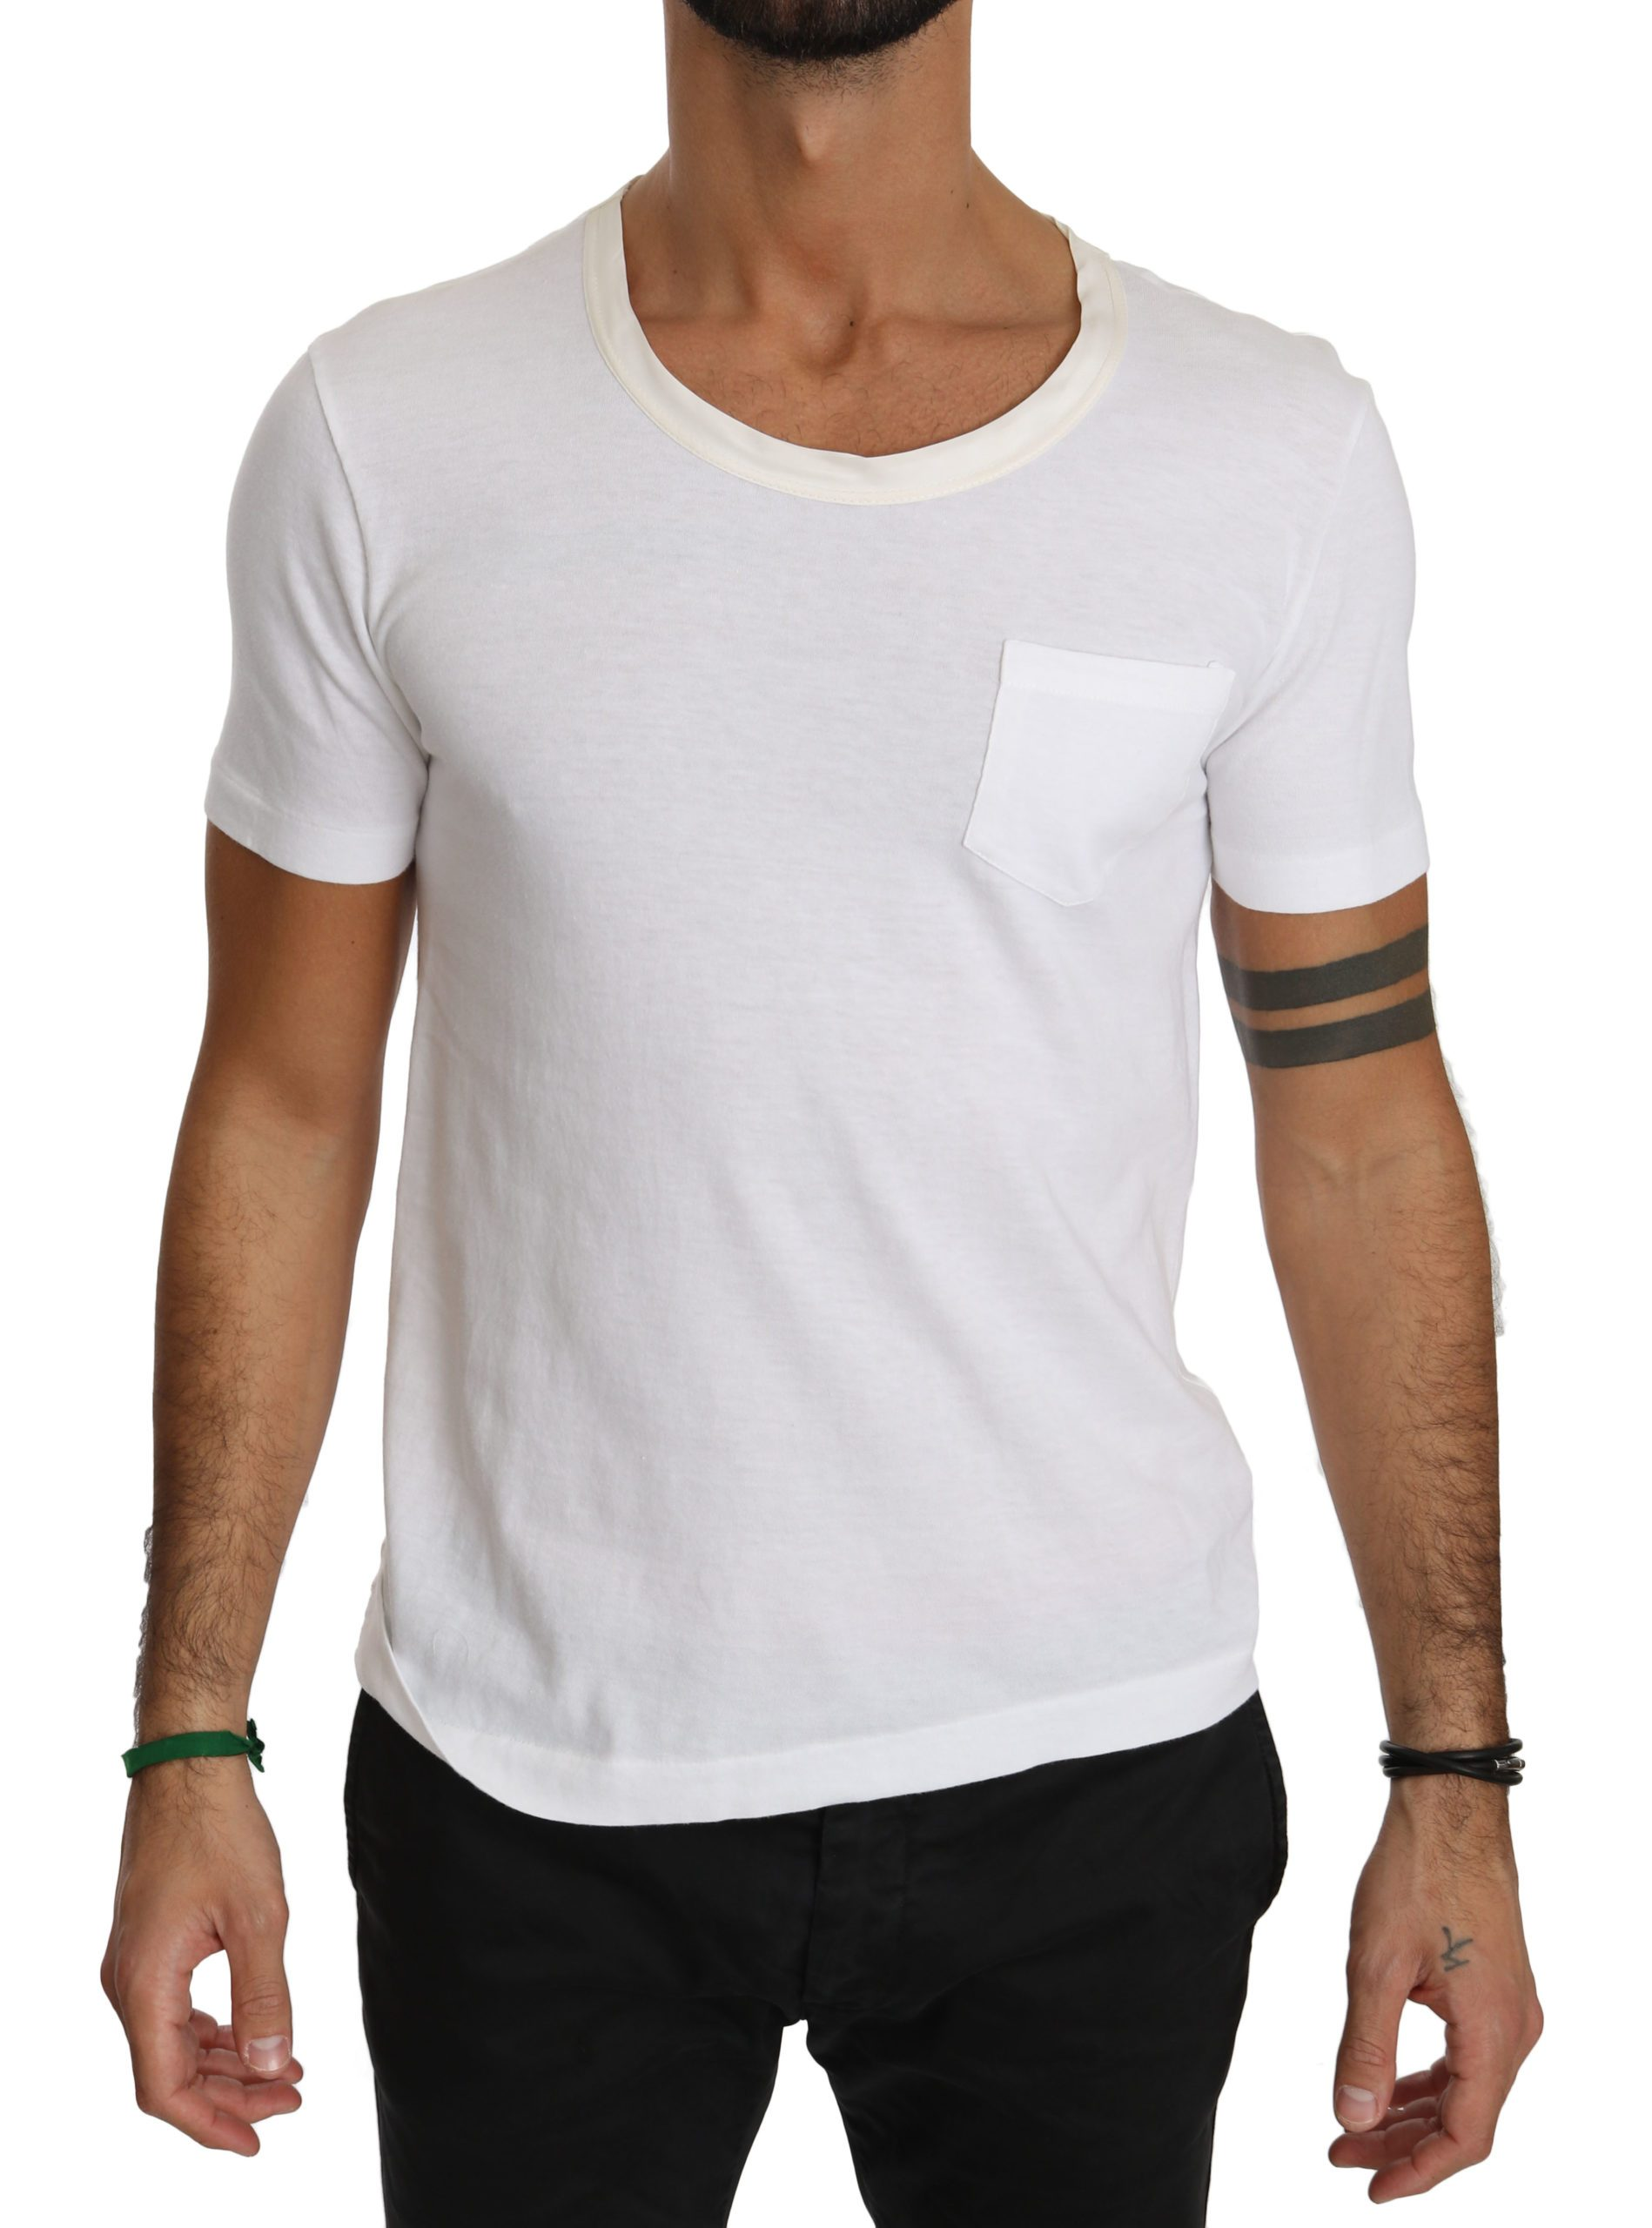 Dolce & Gabbana Men's Roundneck Casual Cotton T-Shirt White TSH4006 - IT48 | M